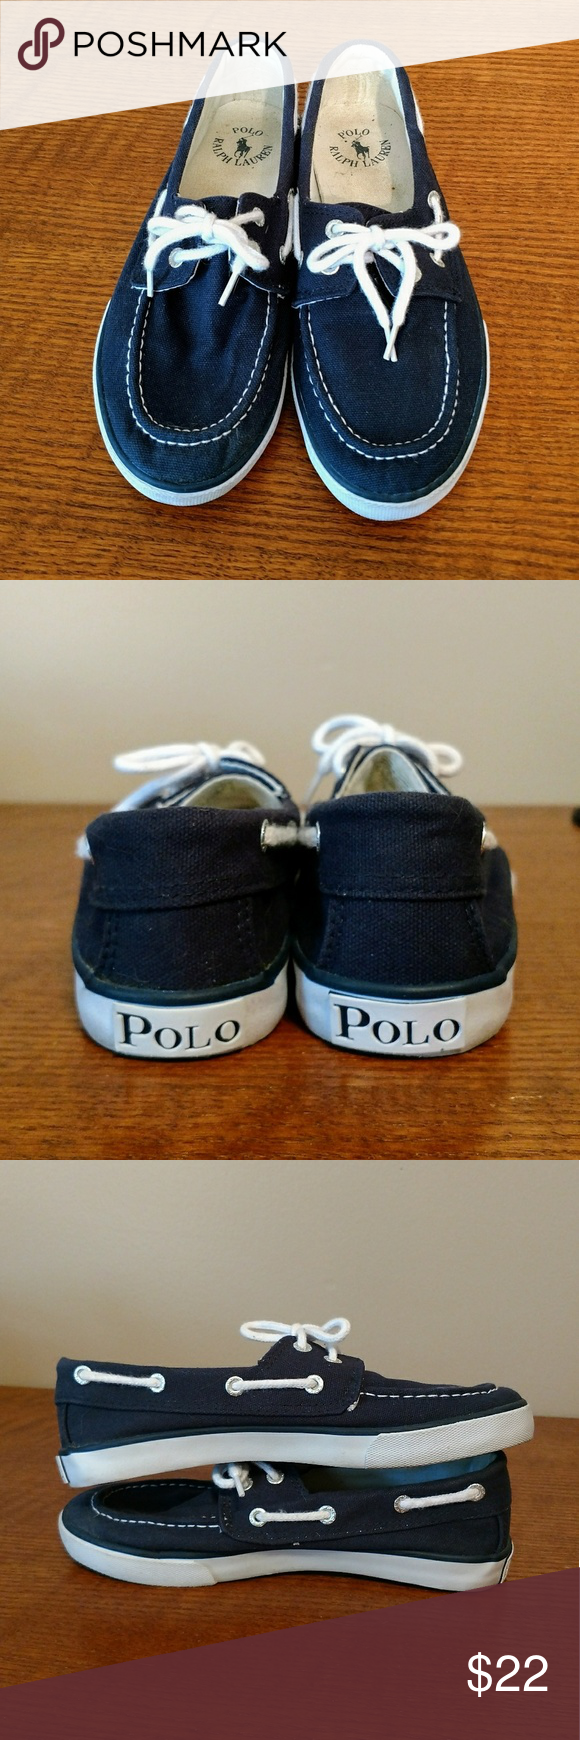 mini polo polo ralph lauren pumps